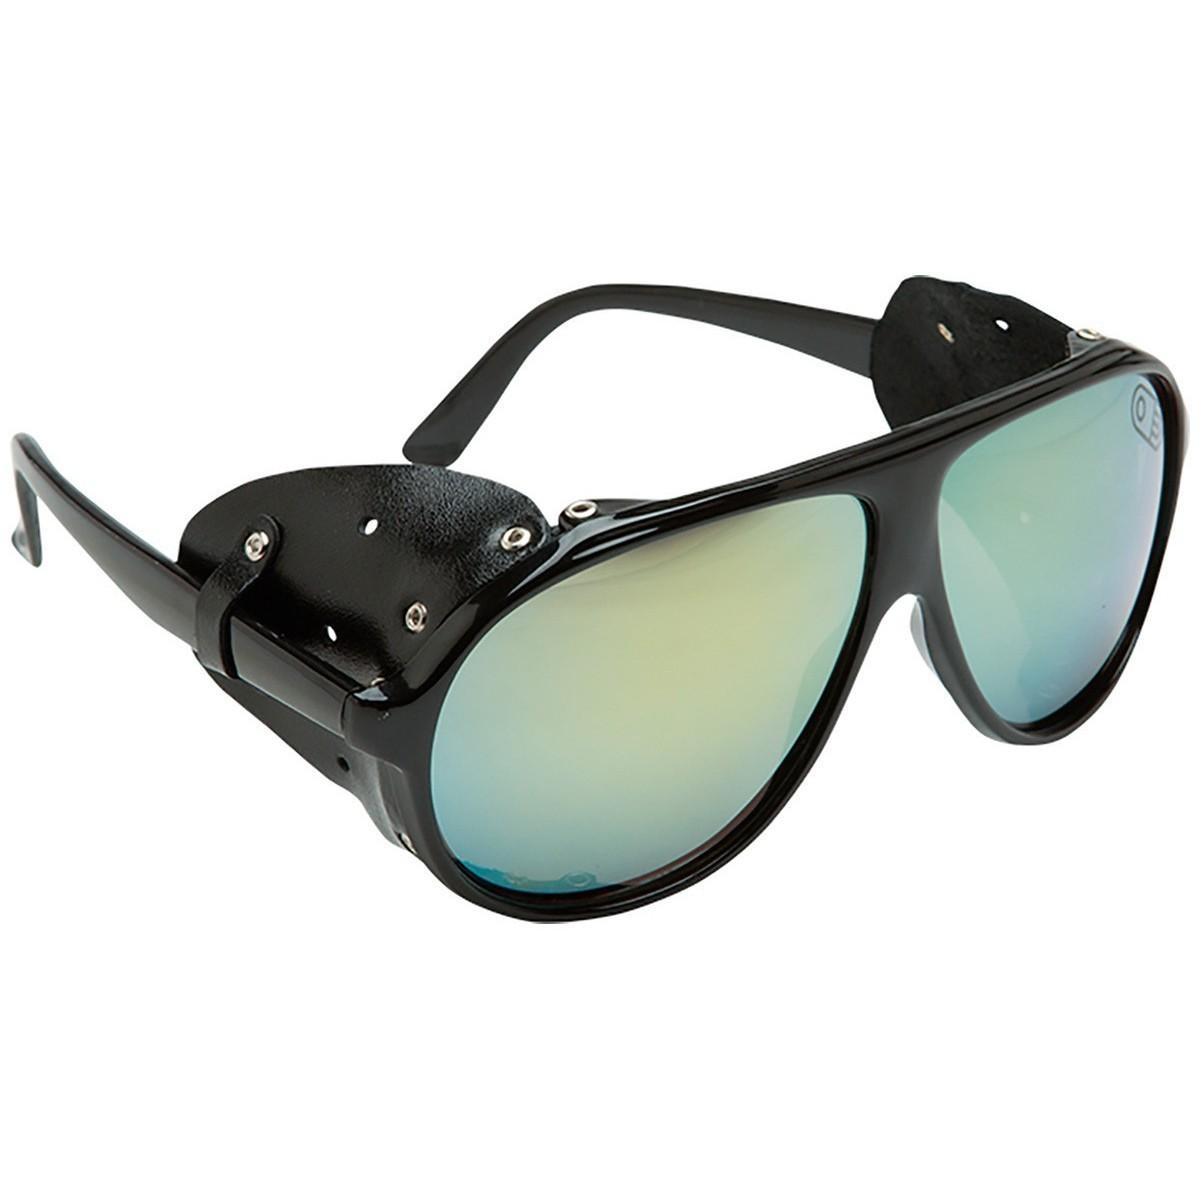 cbbd9471c18 Очки AIRBLASTER Glacier Glasses FW15 купить в Москве